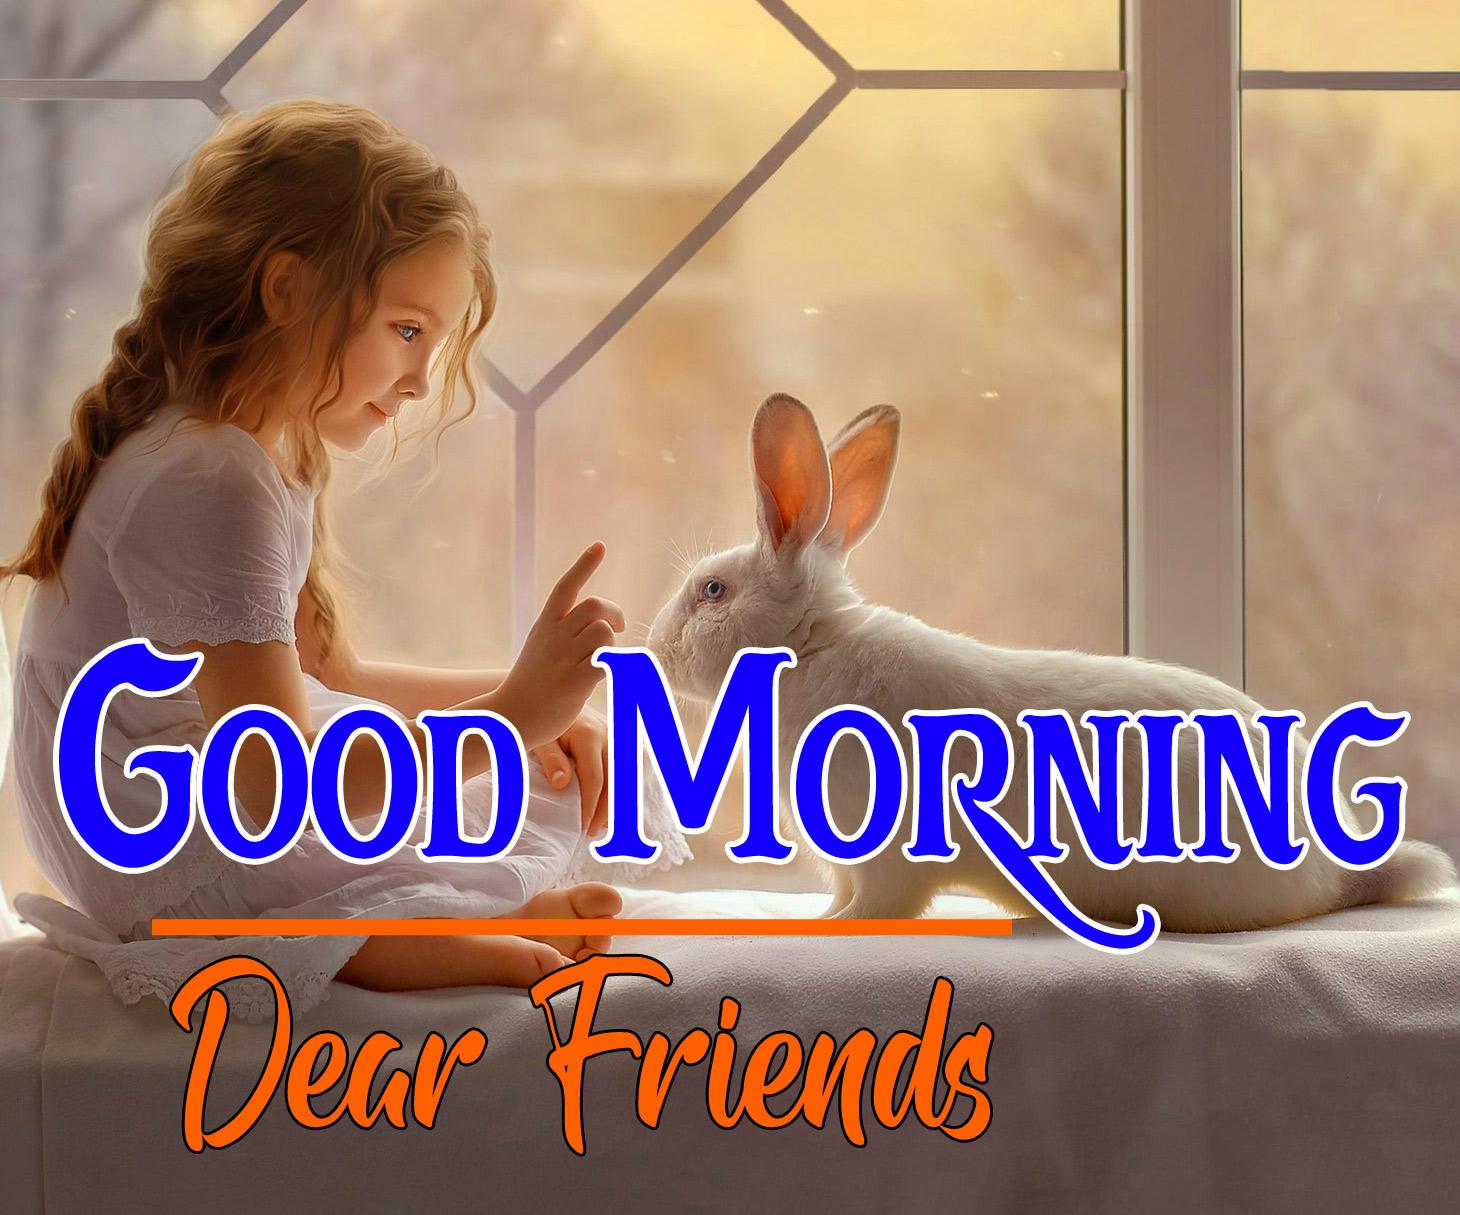 Girl Good Morning Images 3